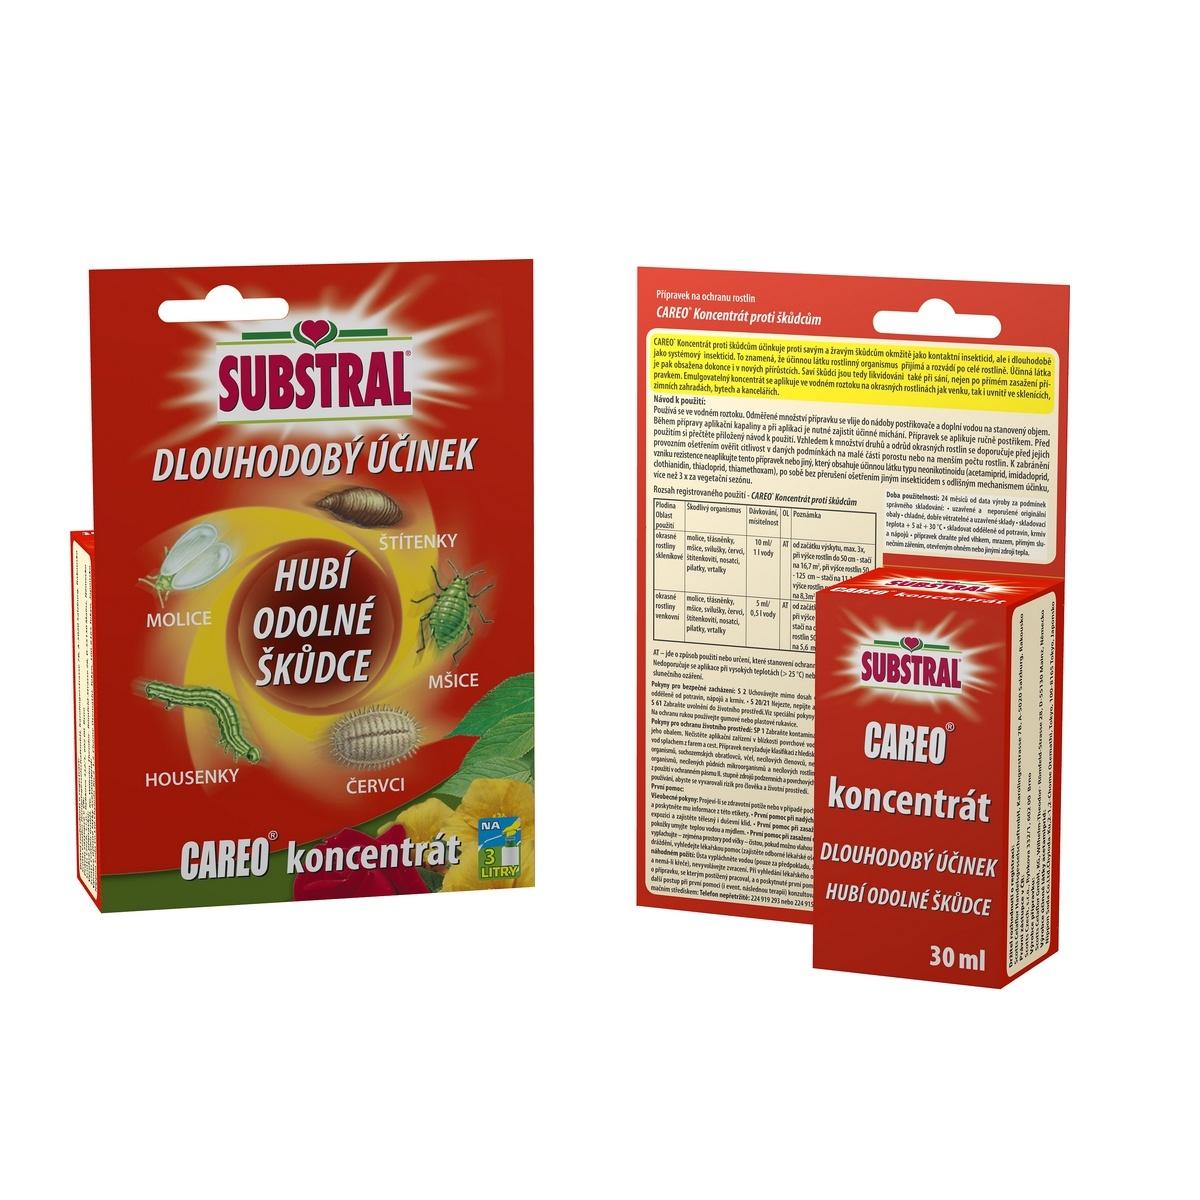 Substral Careo koncentrát, 30 ml